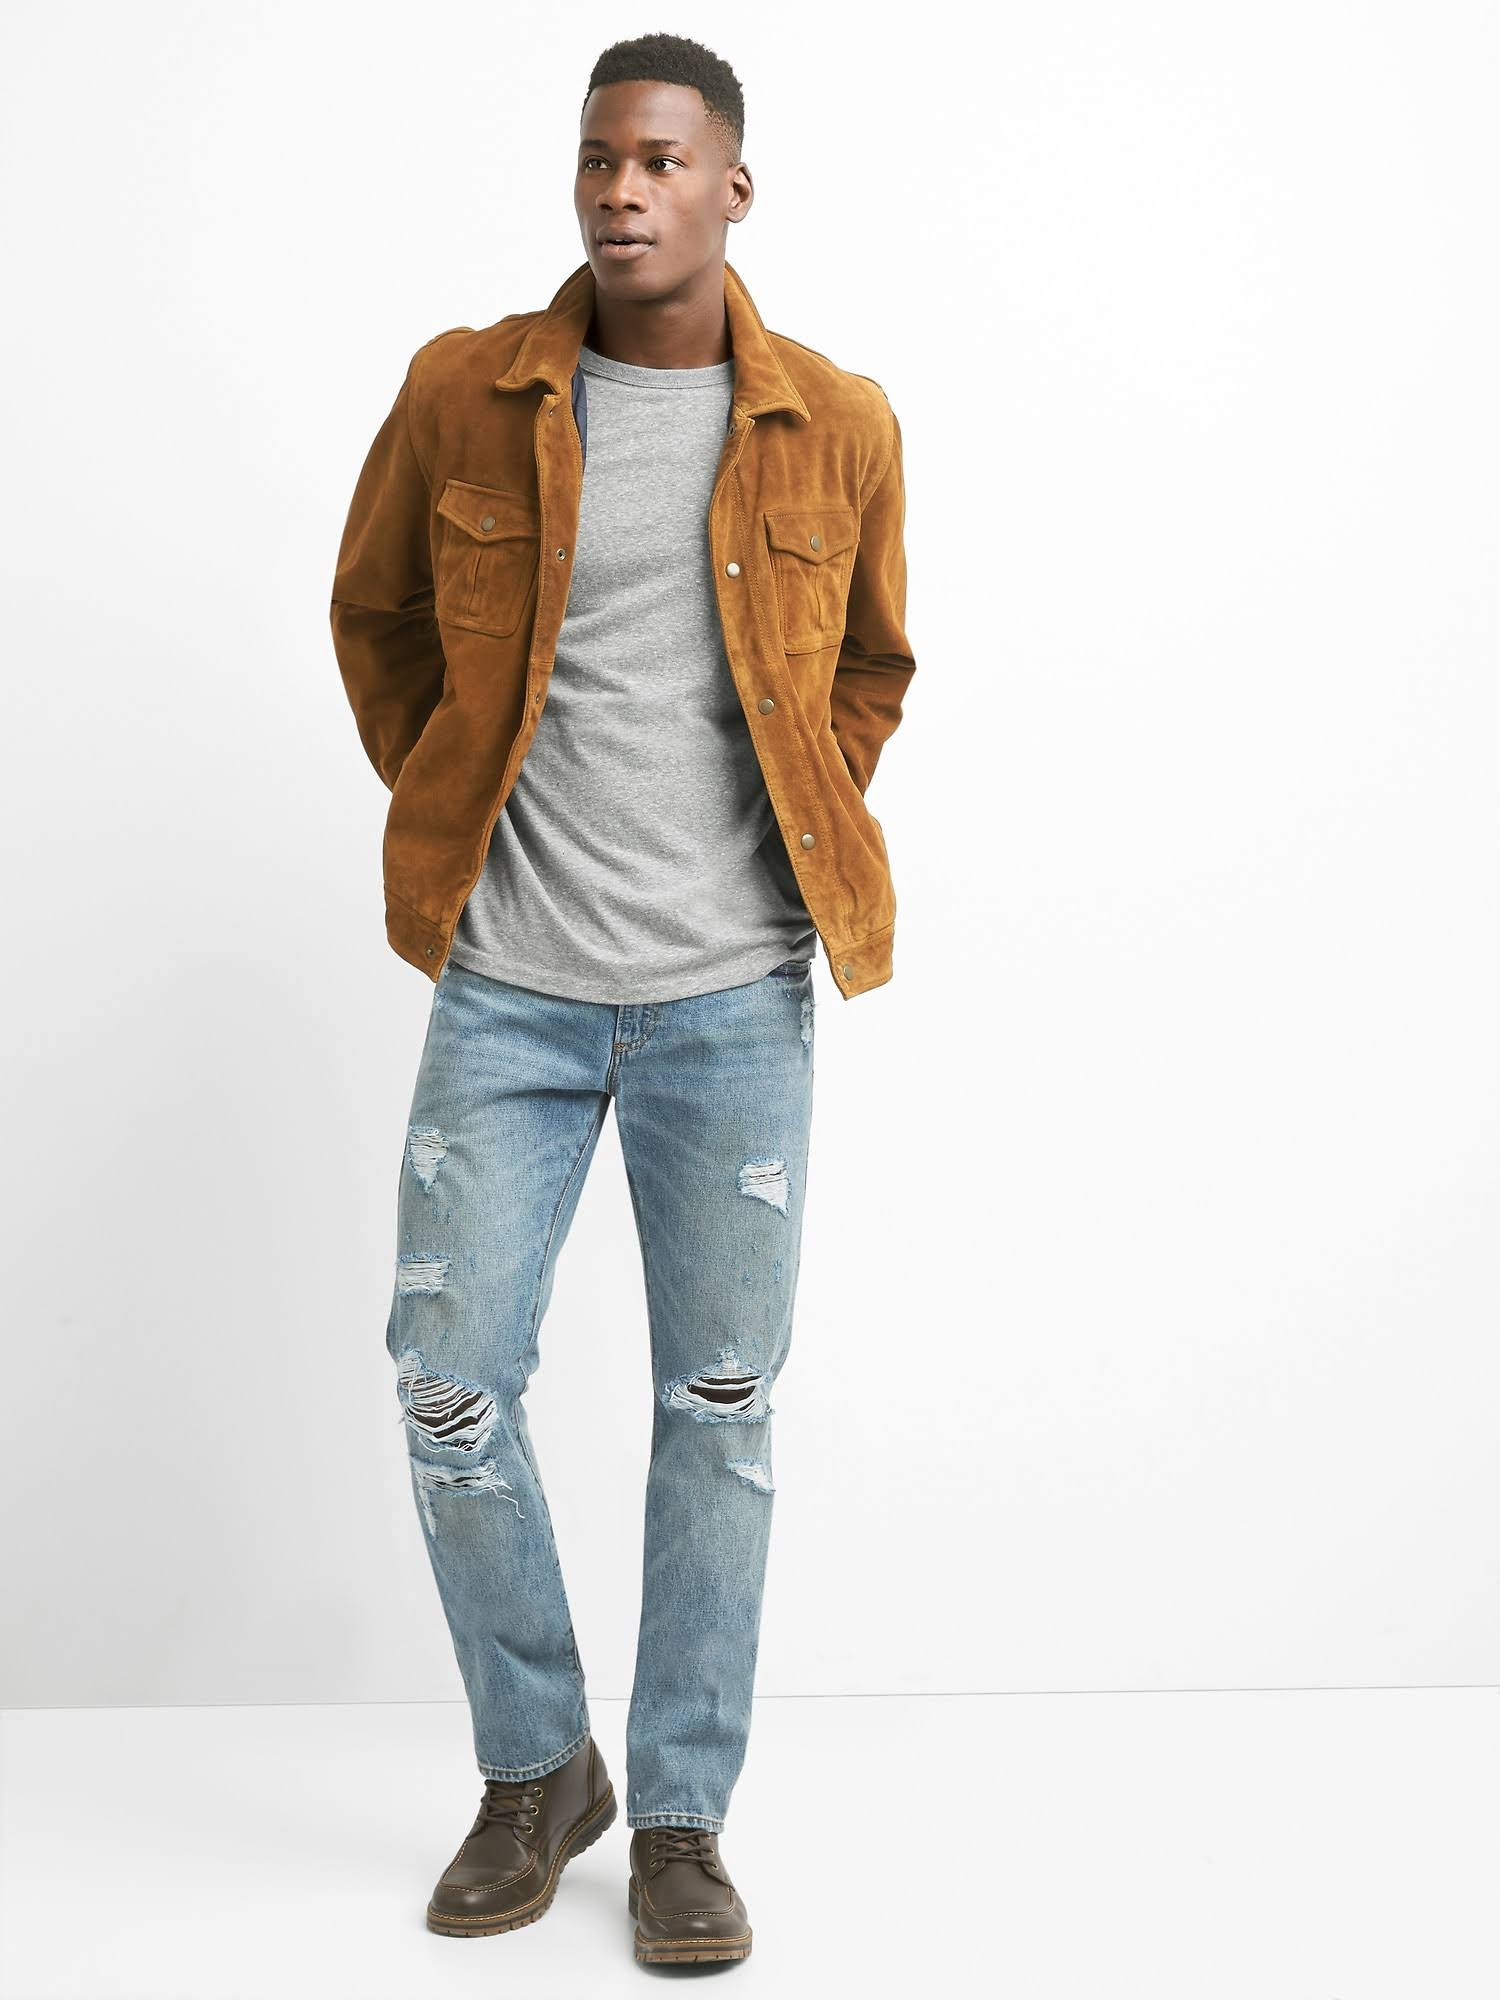 Gamuza Camel Gap Camisa Xs Color Para Hombre De Talla Clásico 57n61p